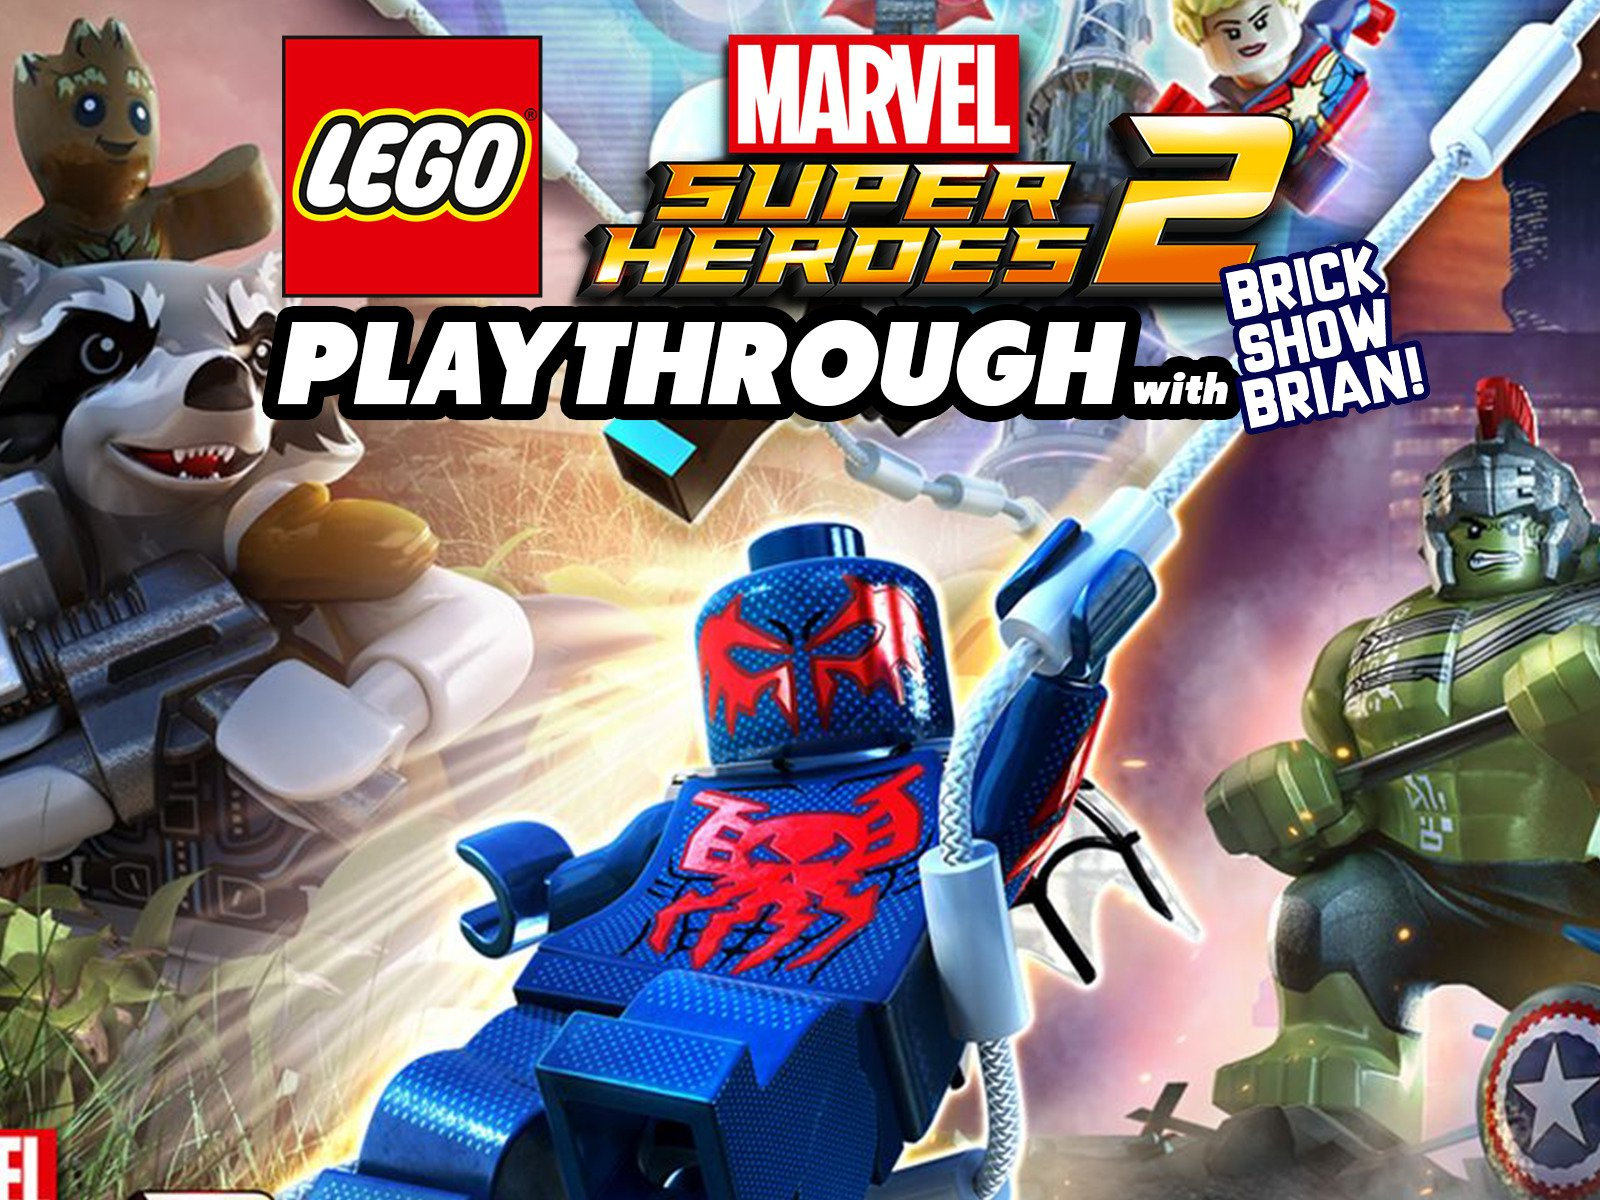 Clip: Lego Marvel Super Heroes 2 Playthrough with Brick Show Brian - Season 1